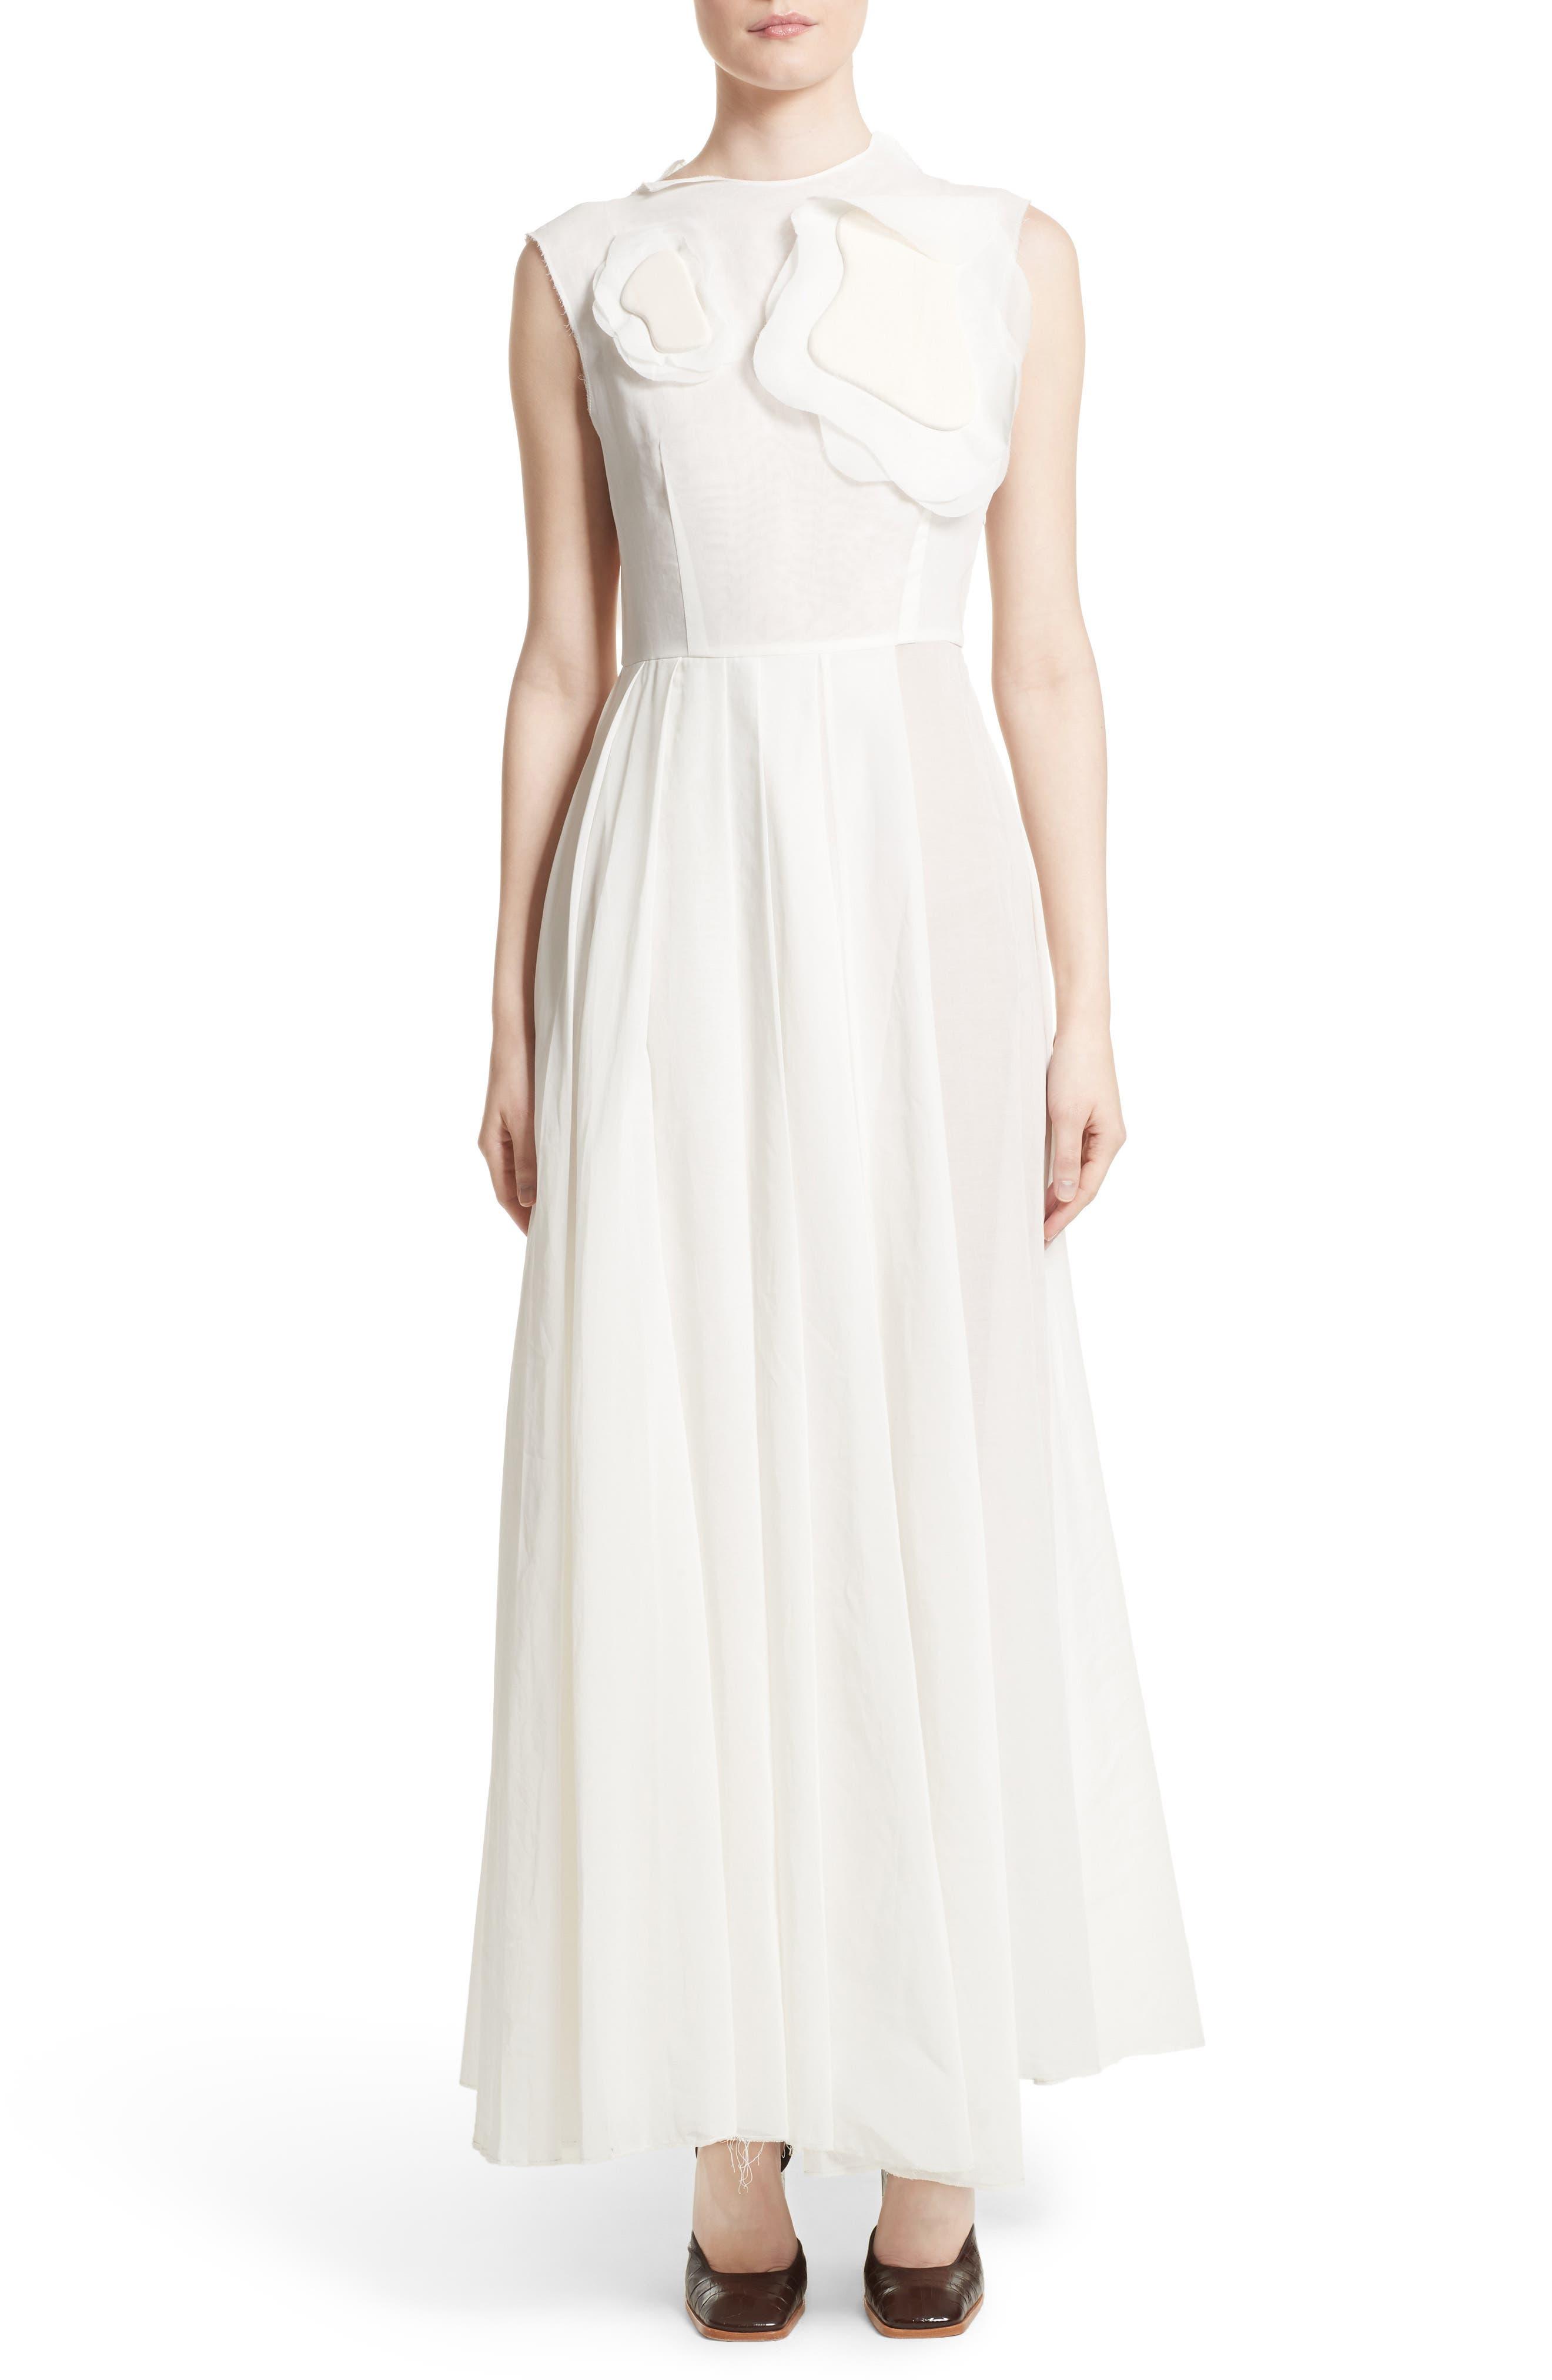 Main Image - A.W.A.K.E. Double Layer Organdy Dress